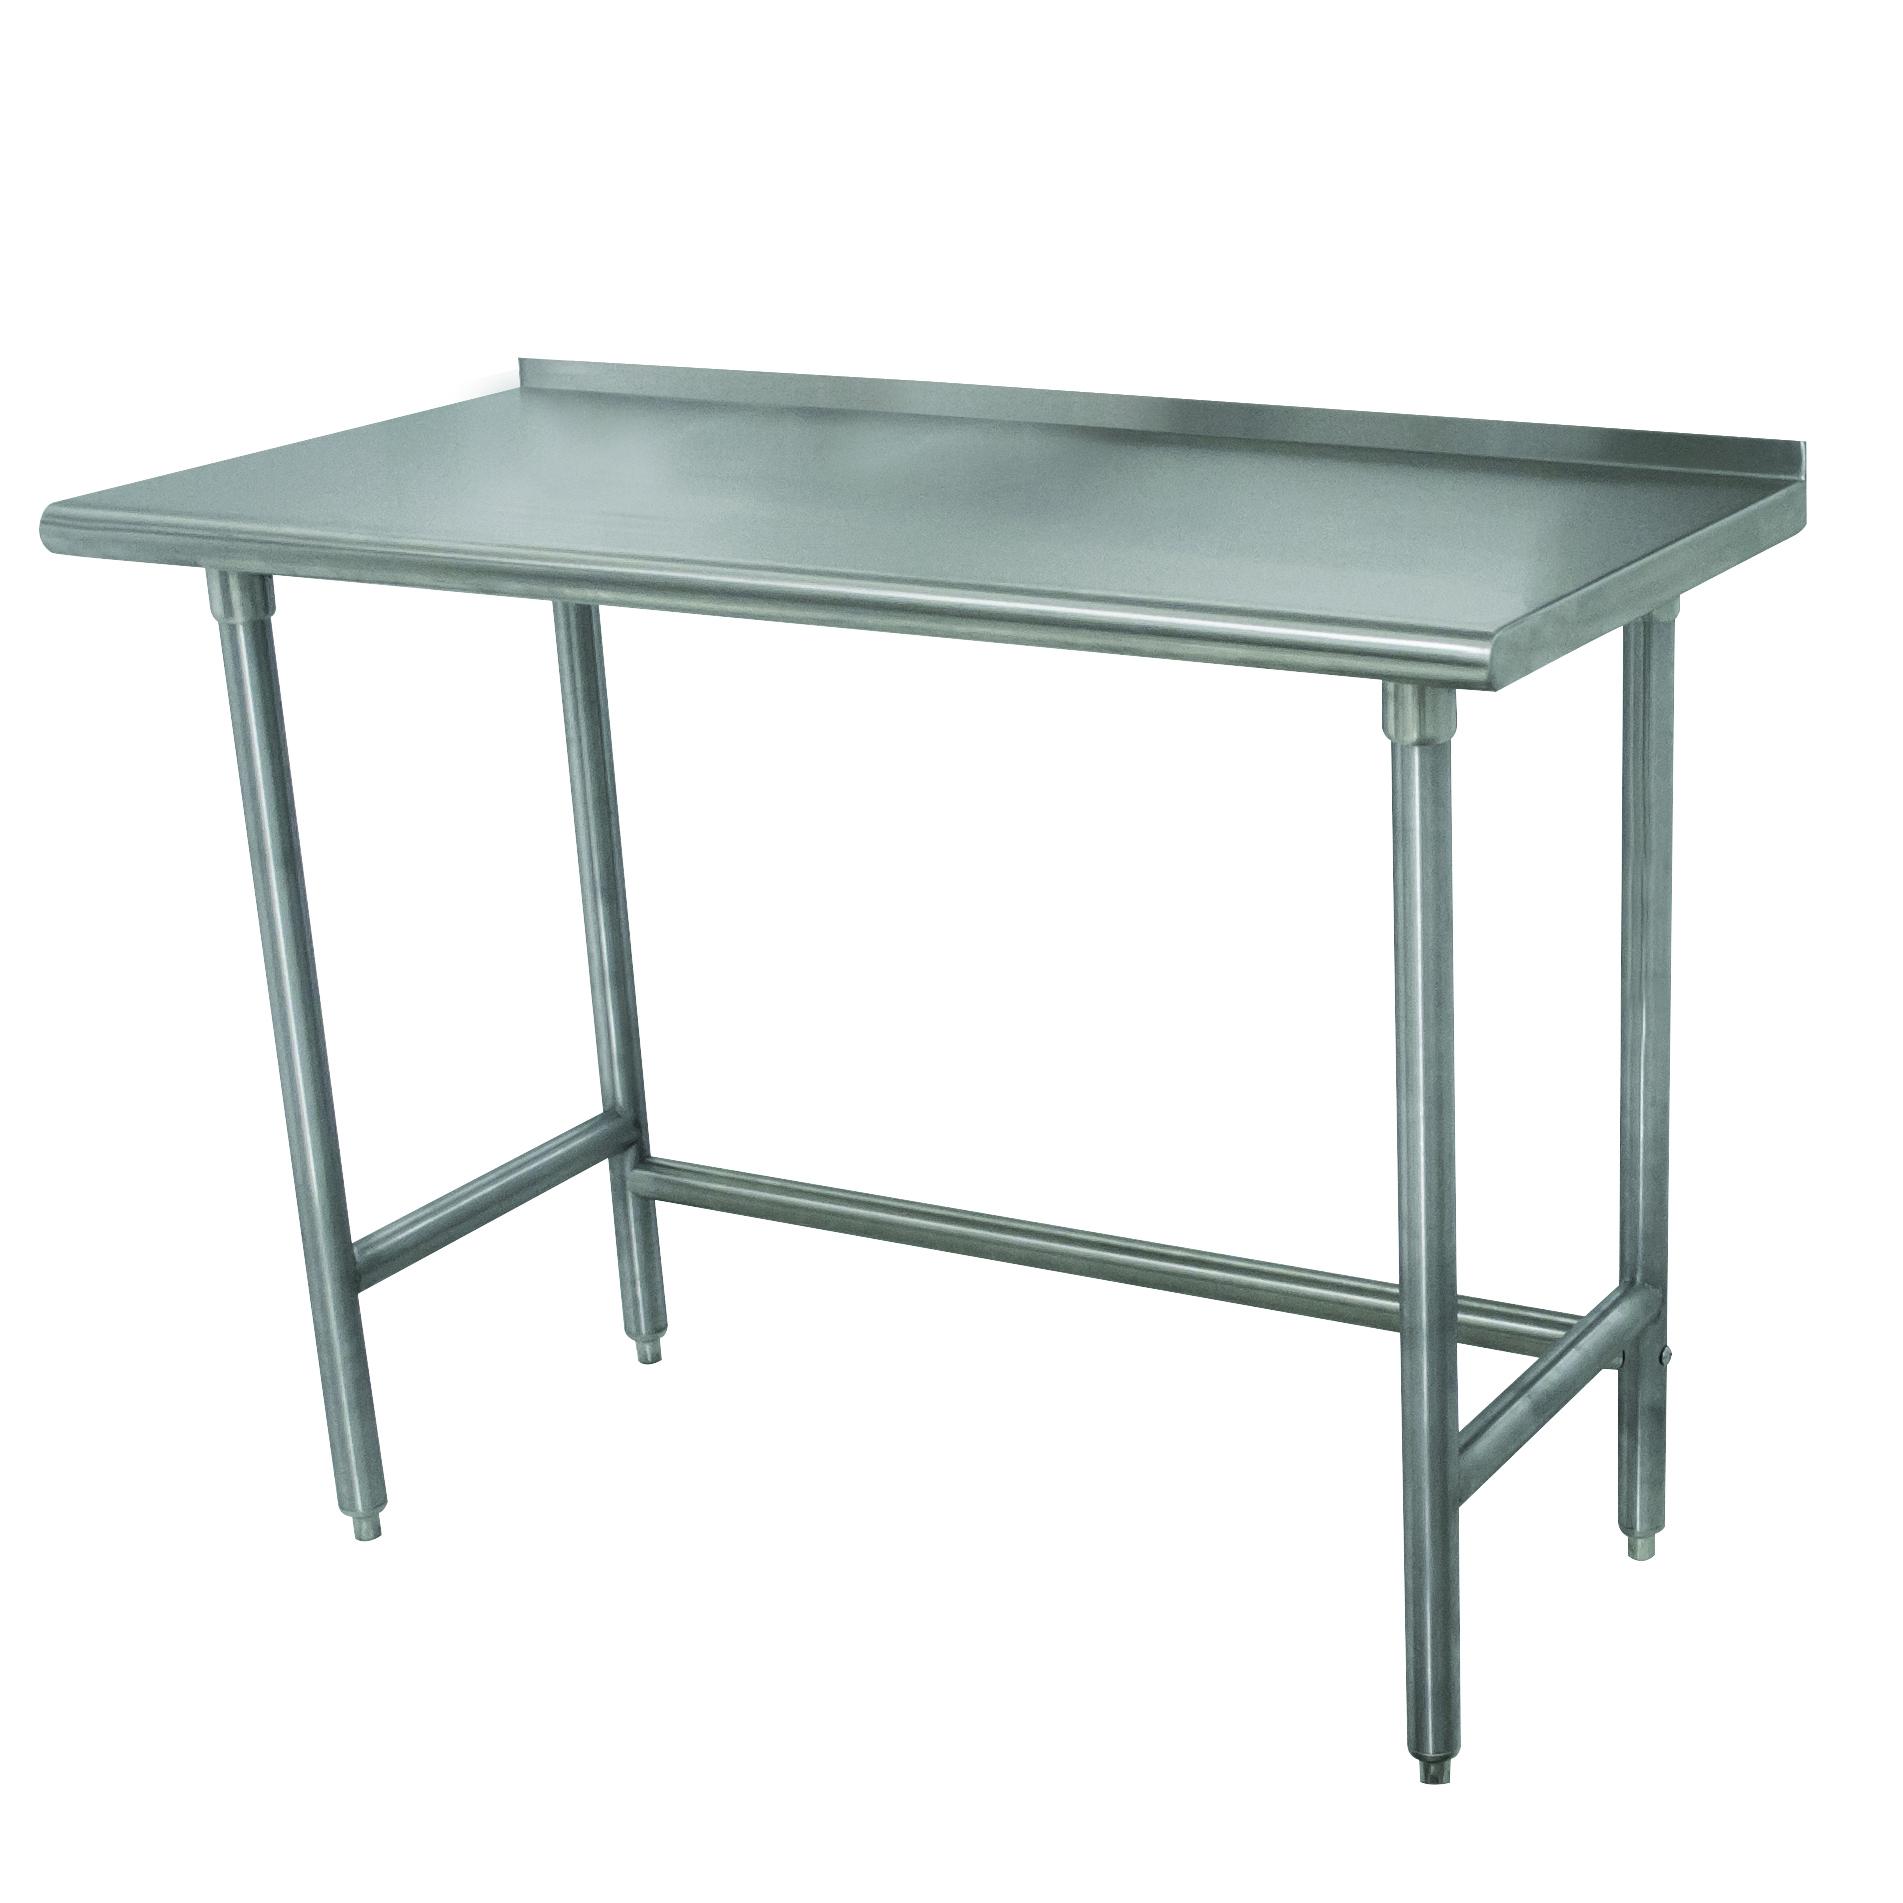 Advance Tabco TFLAG-368-X work table,  85